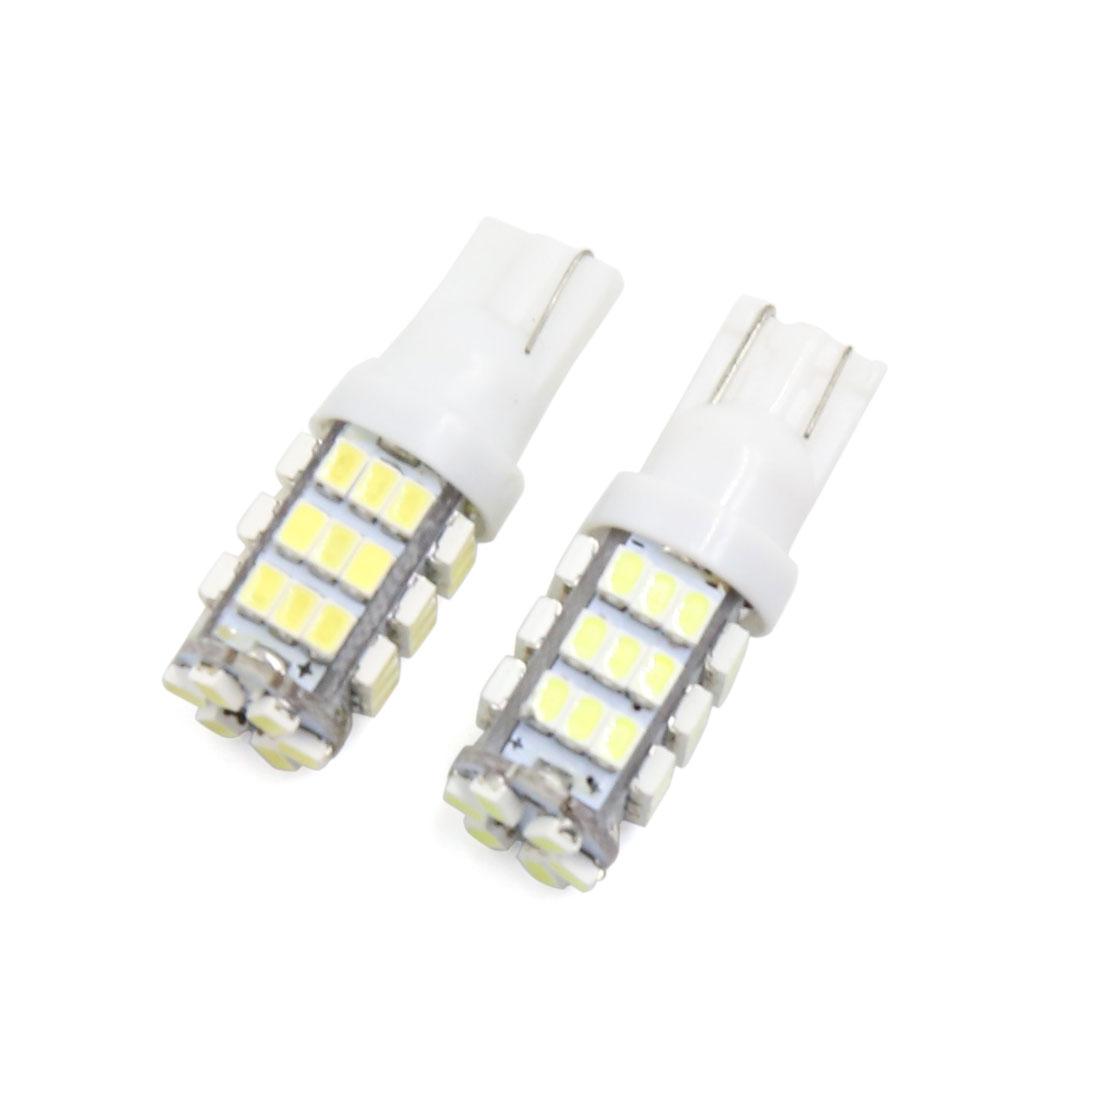 2Pcs White T10 42 Led Car Vehcile Dashboard Light Lamp Interior 2825 158 192 194